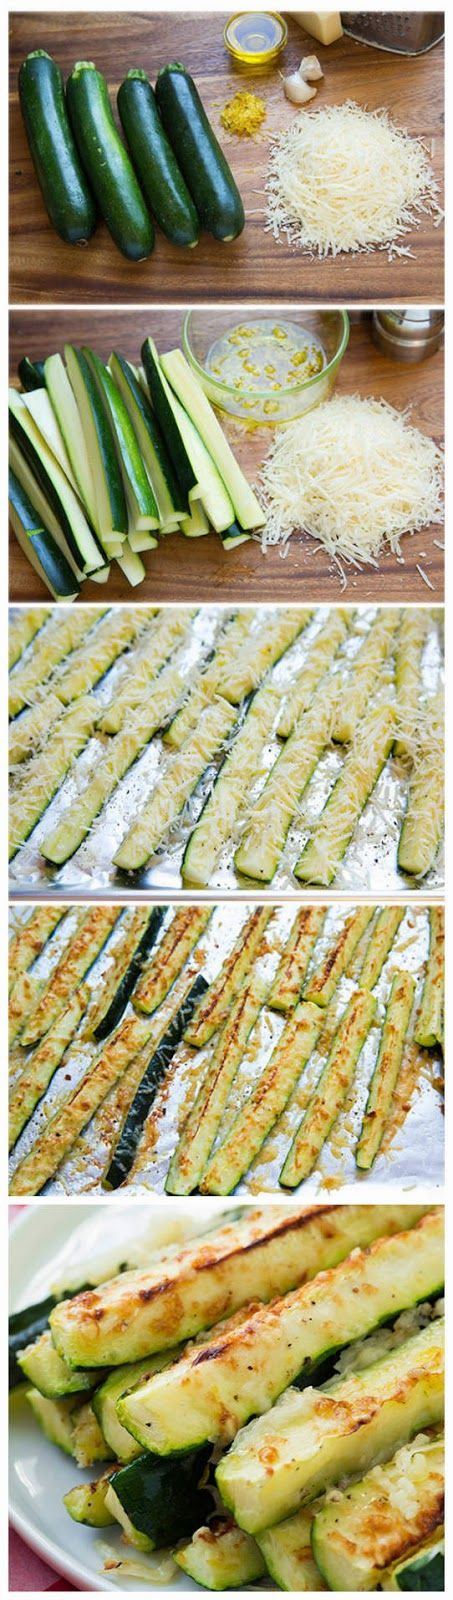 Ingredients   1 1/2 lbs zucchini (about 4 - 5 small/medium zucchini)  2 Tbsp olive oil  Zest of 1 small lemon (1 tsp)  2 cloves garlic, c...